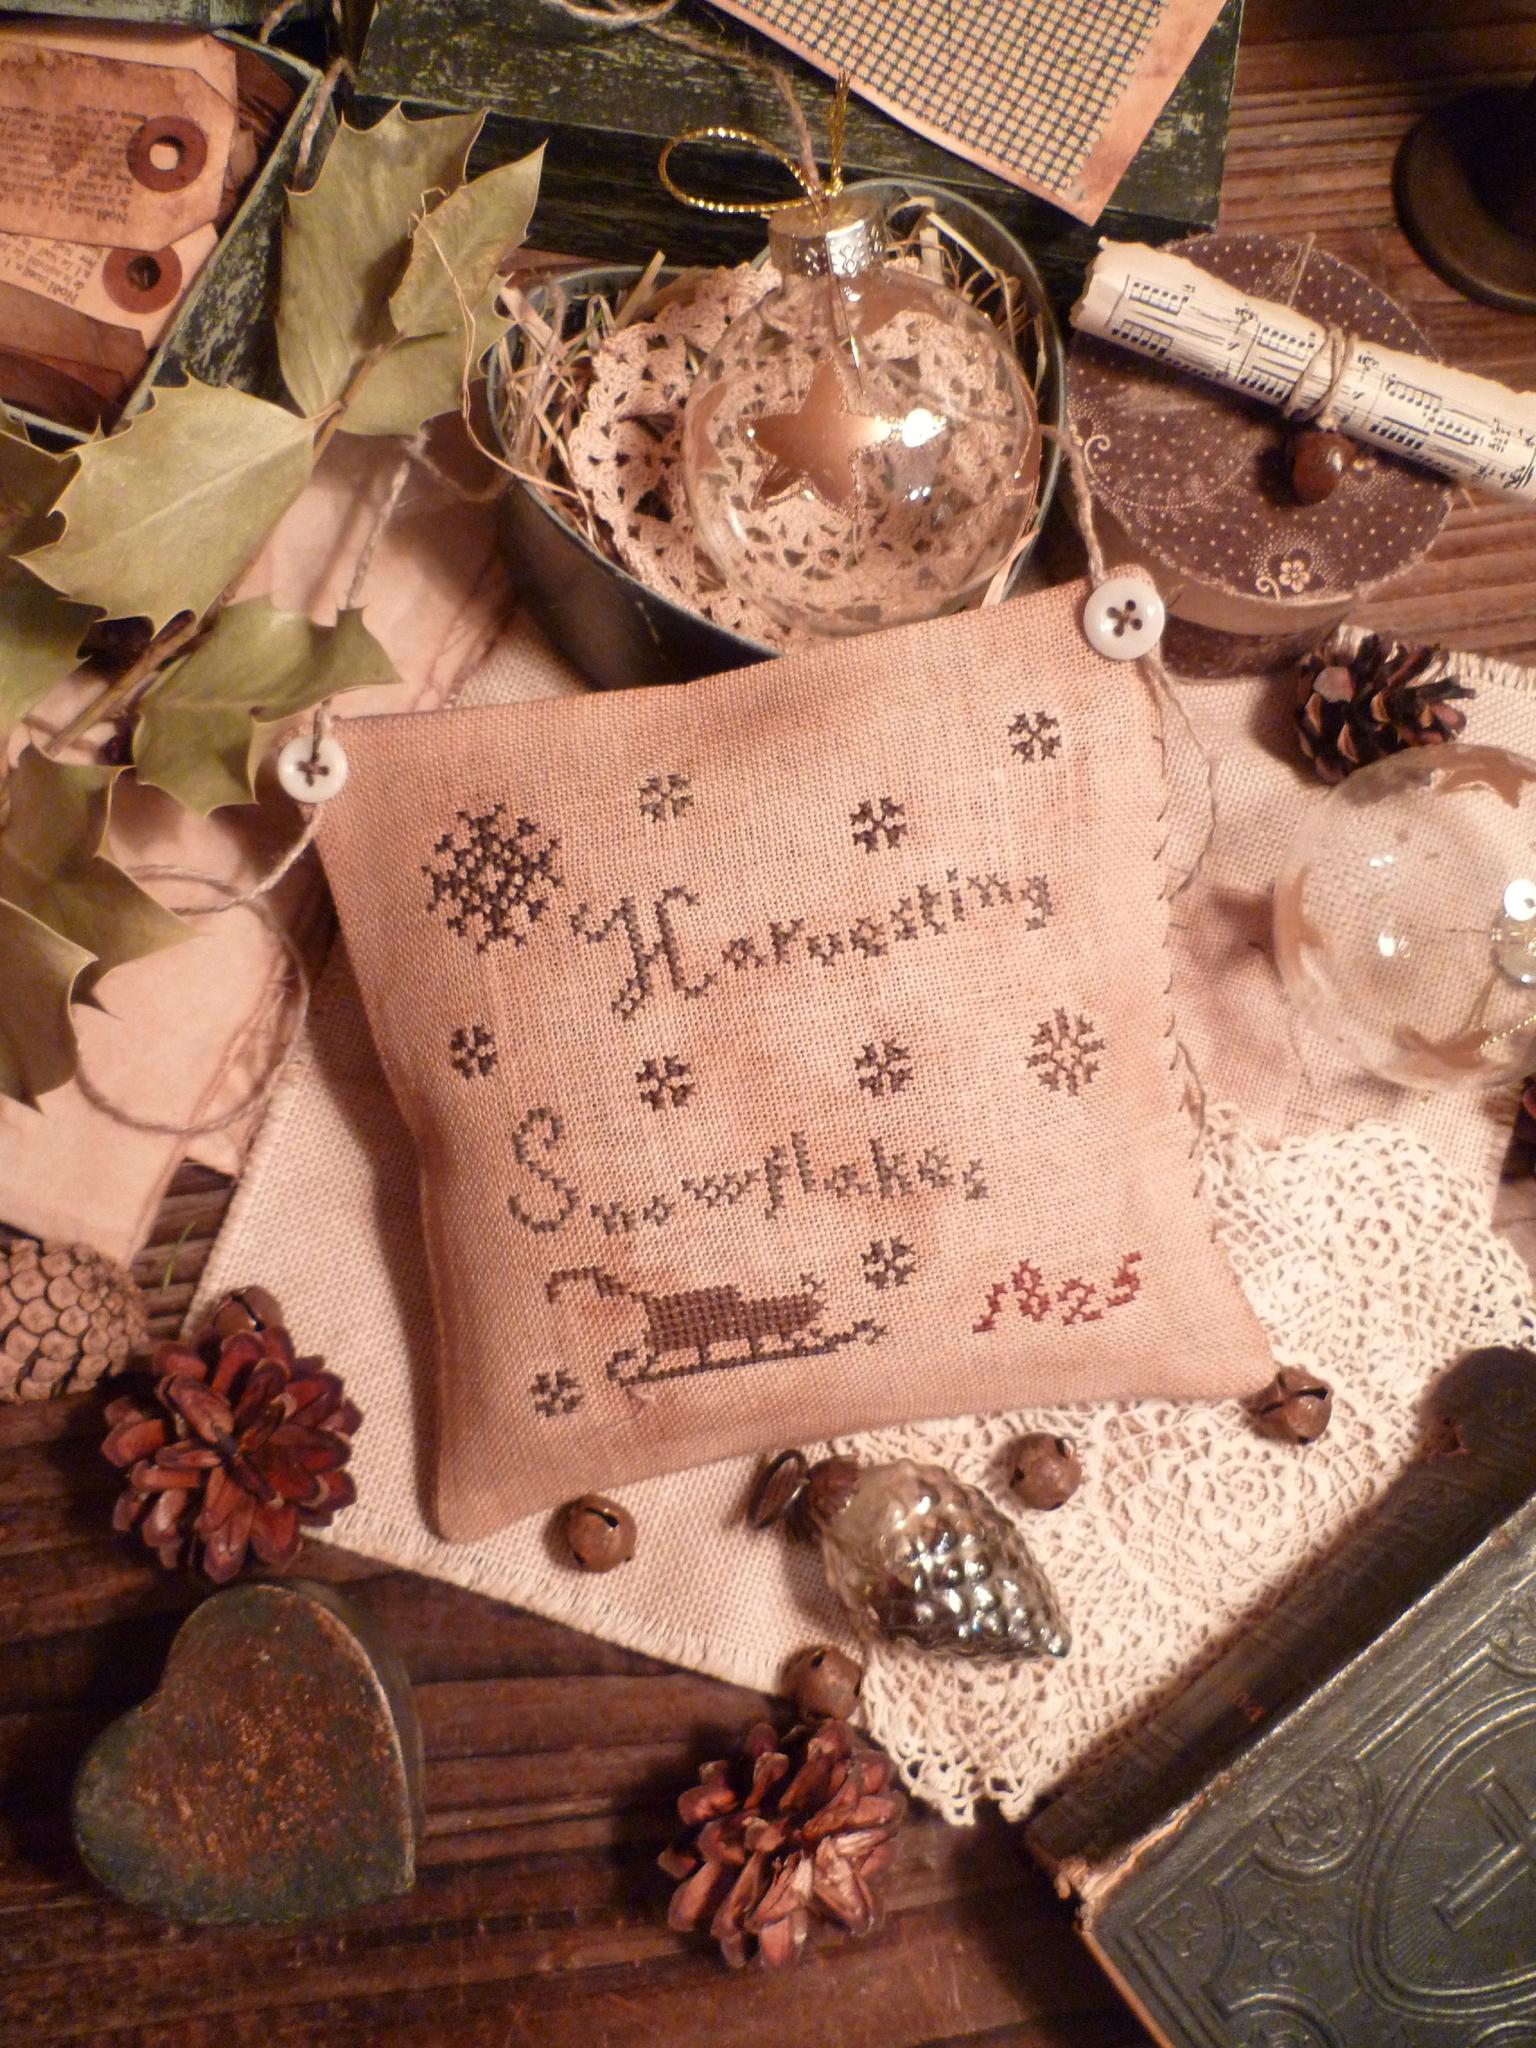 Harvesting Snowflakes US$ 8.00